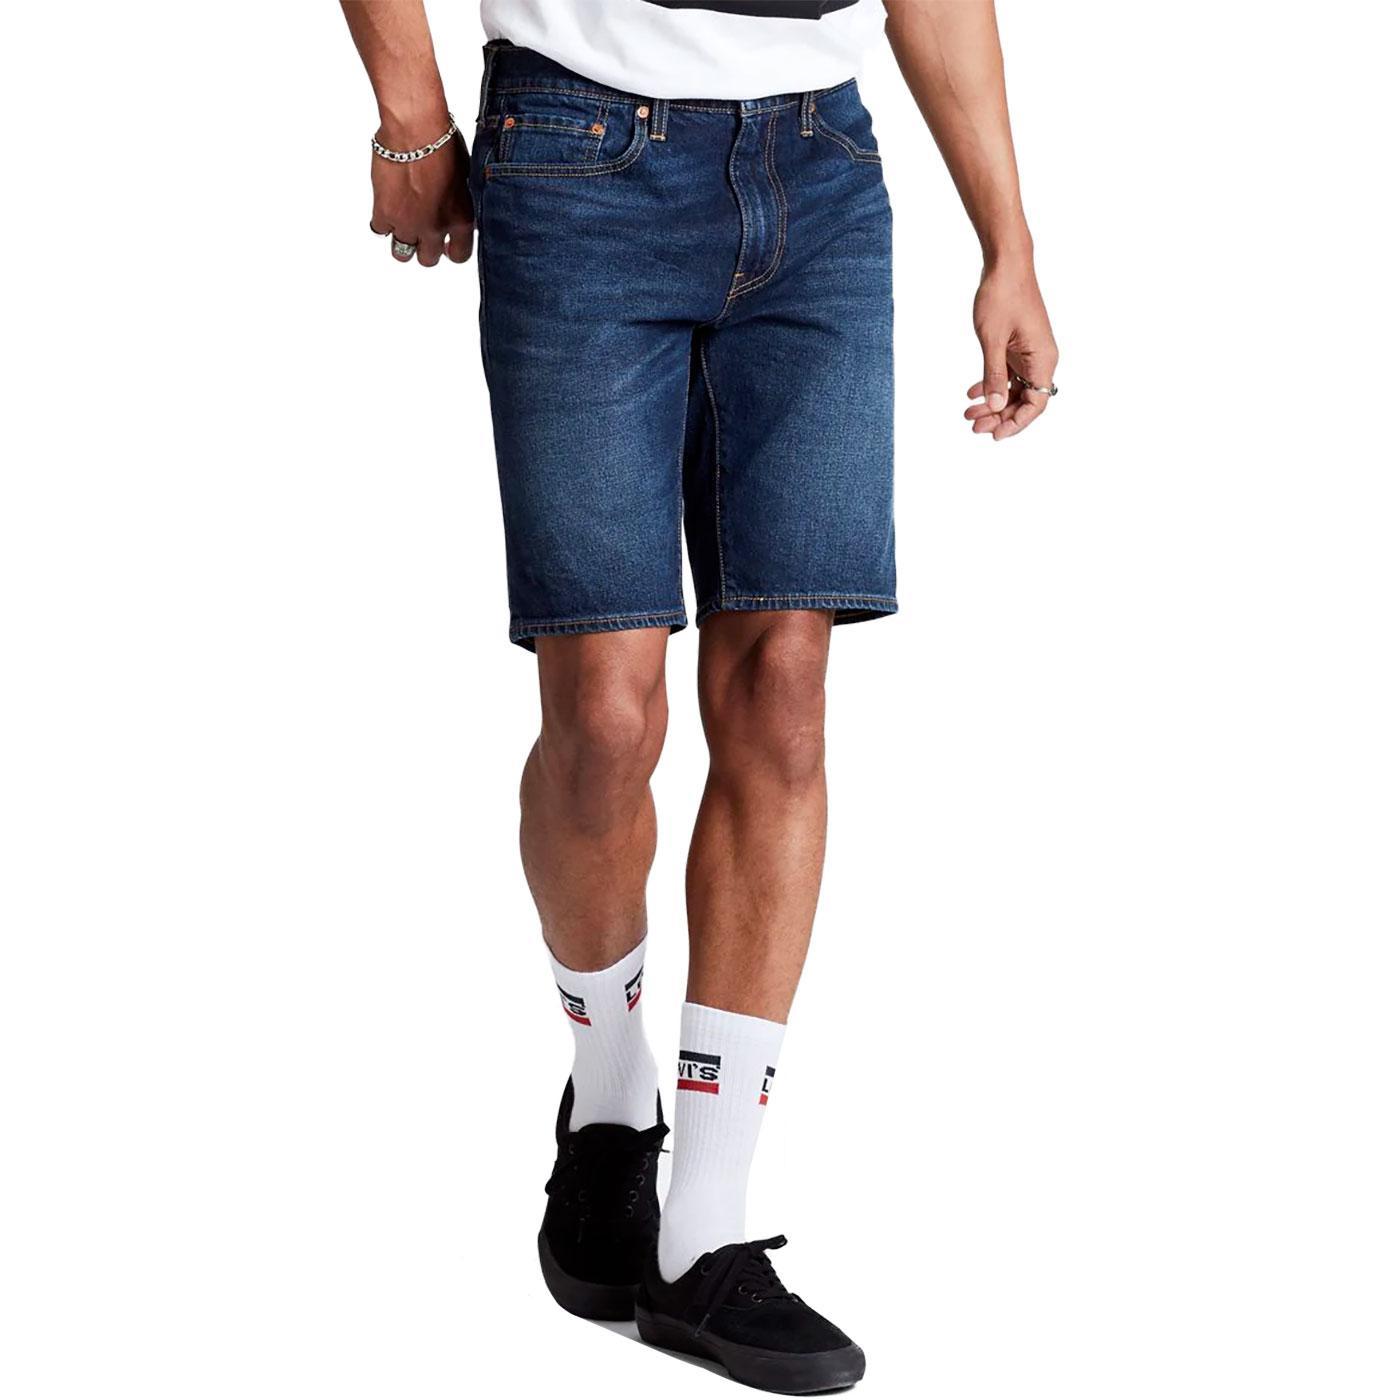 LEVI'S 502 Taper Denim Hemmed Shorts Cheviot Blue